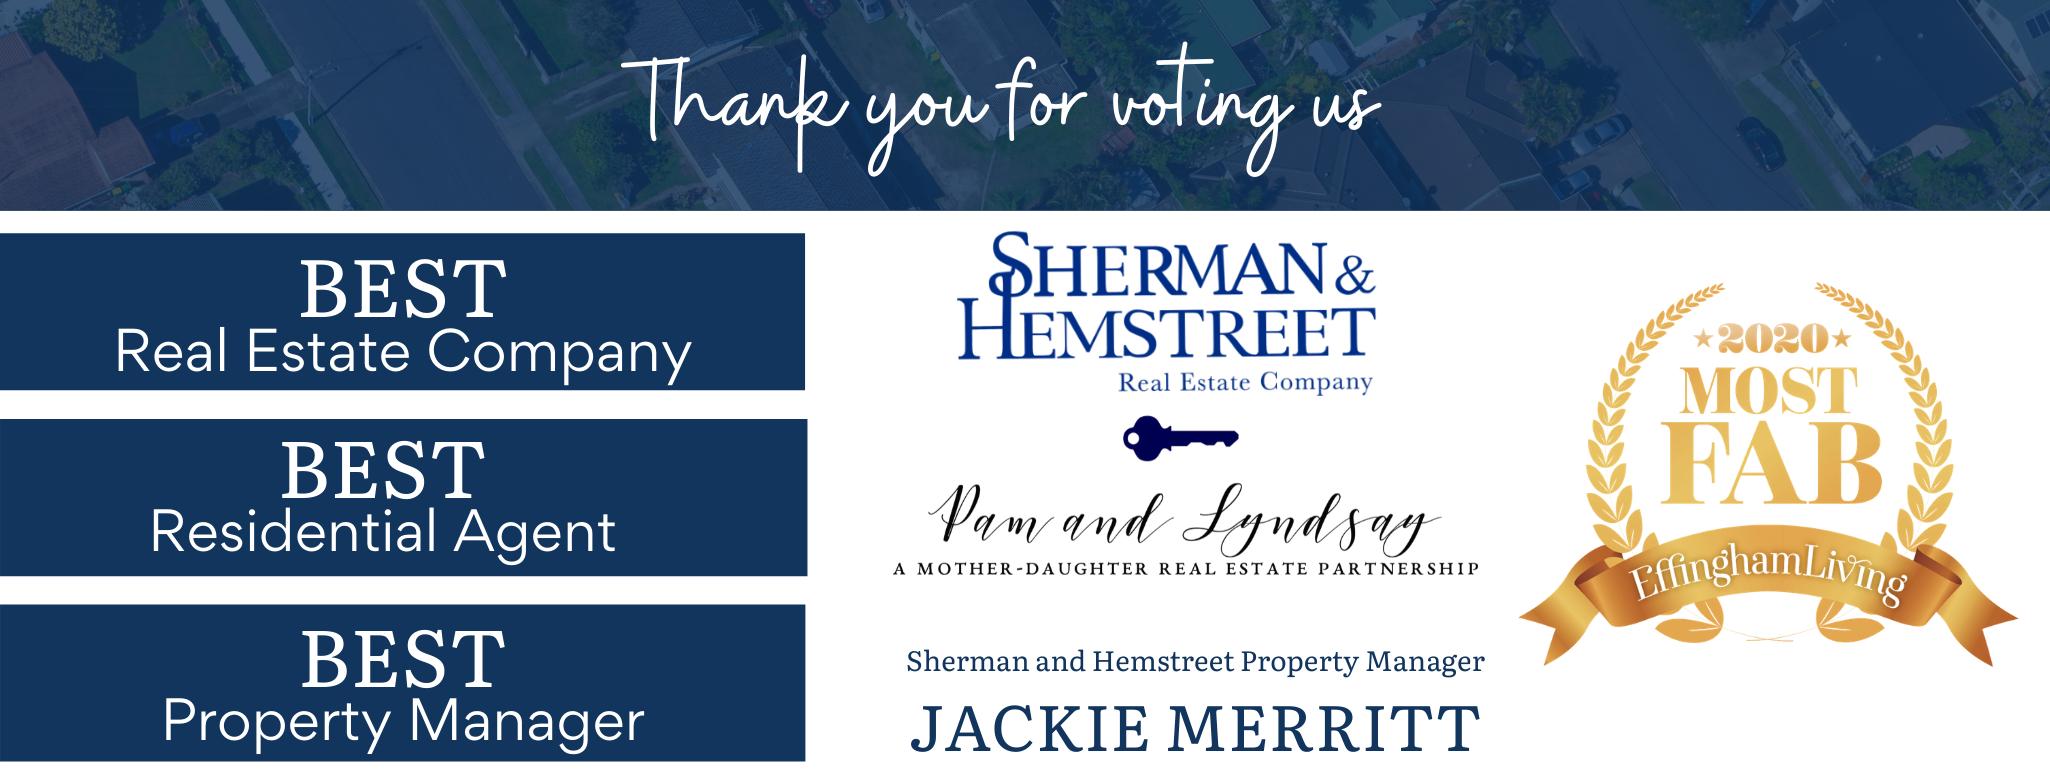 2020 Most Fab Awards | Sherman and Hemstreet